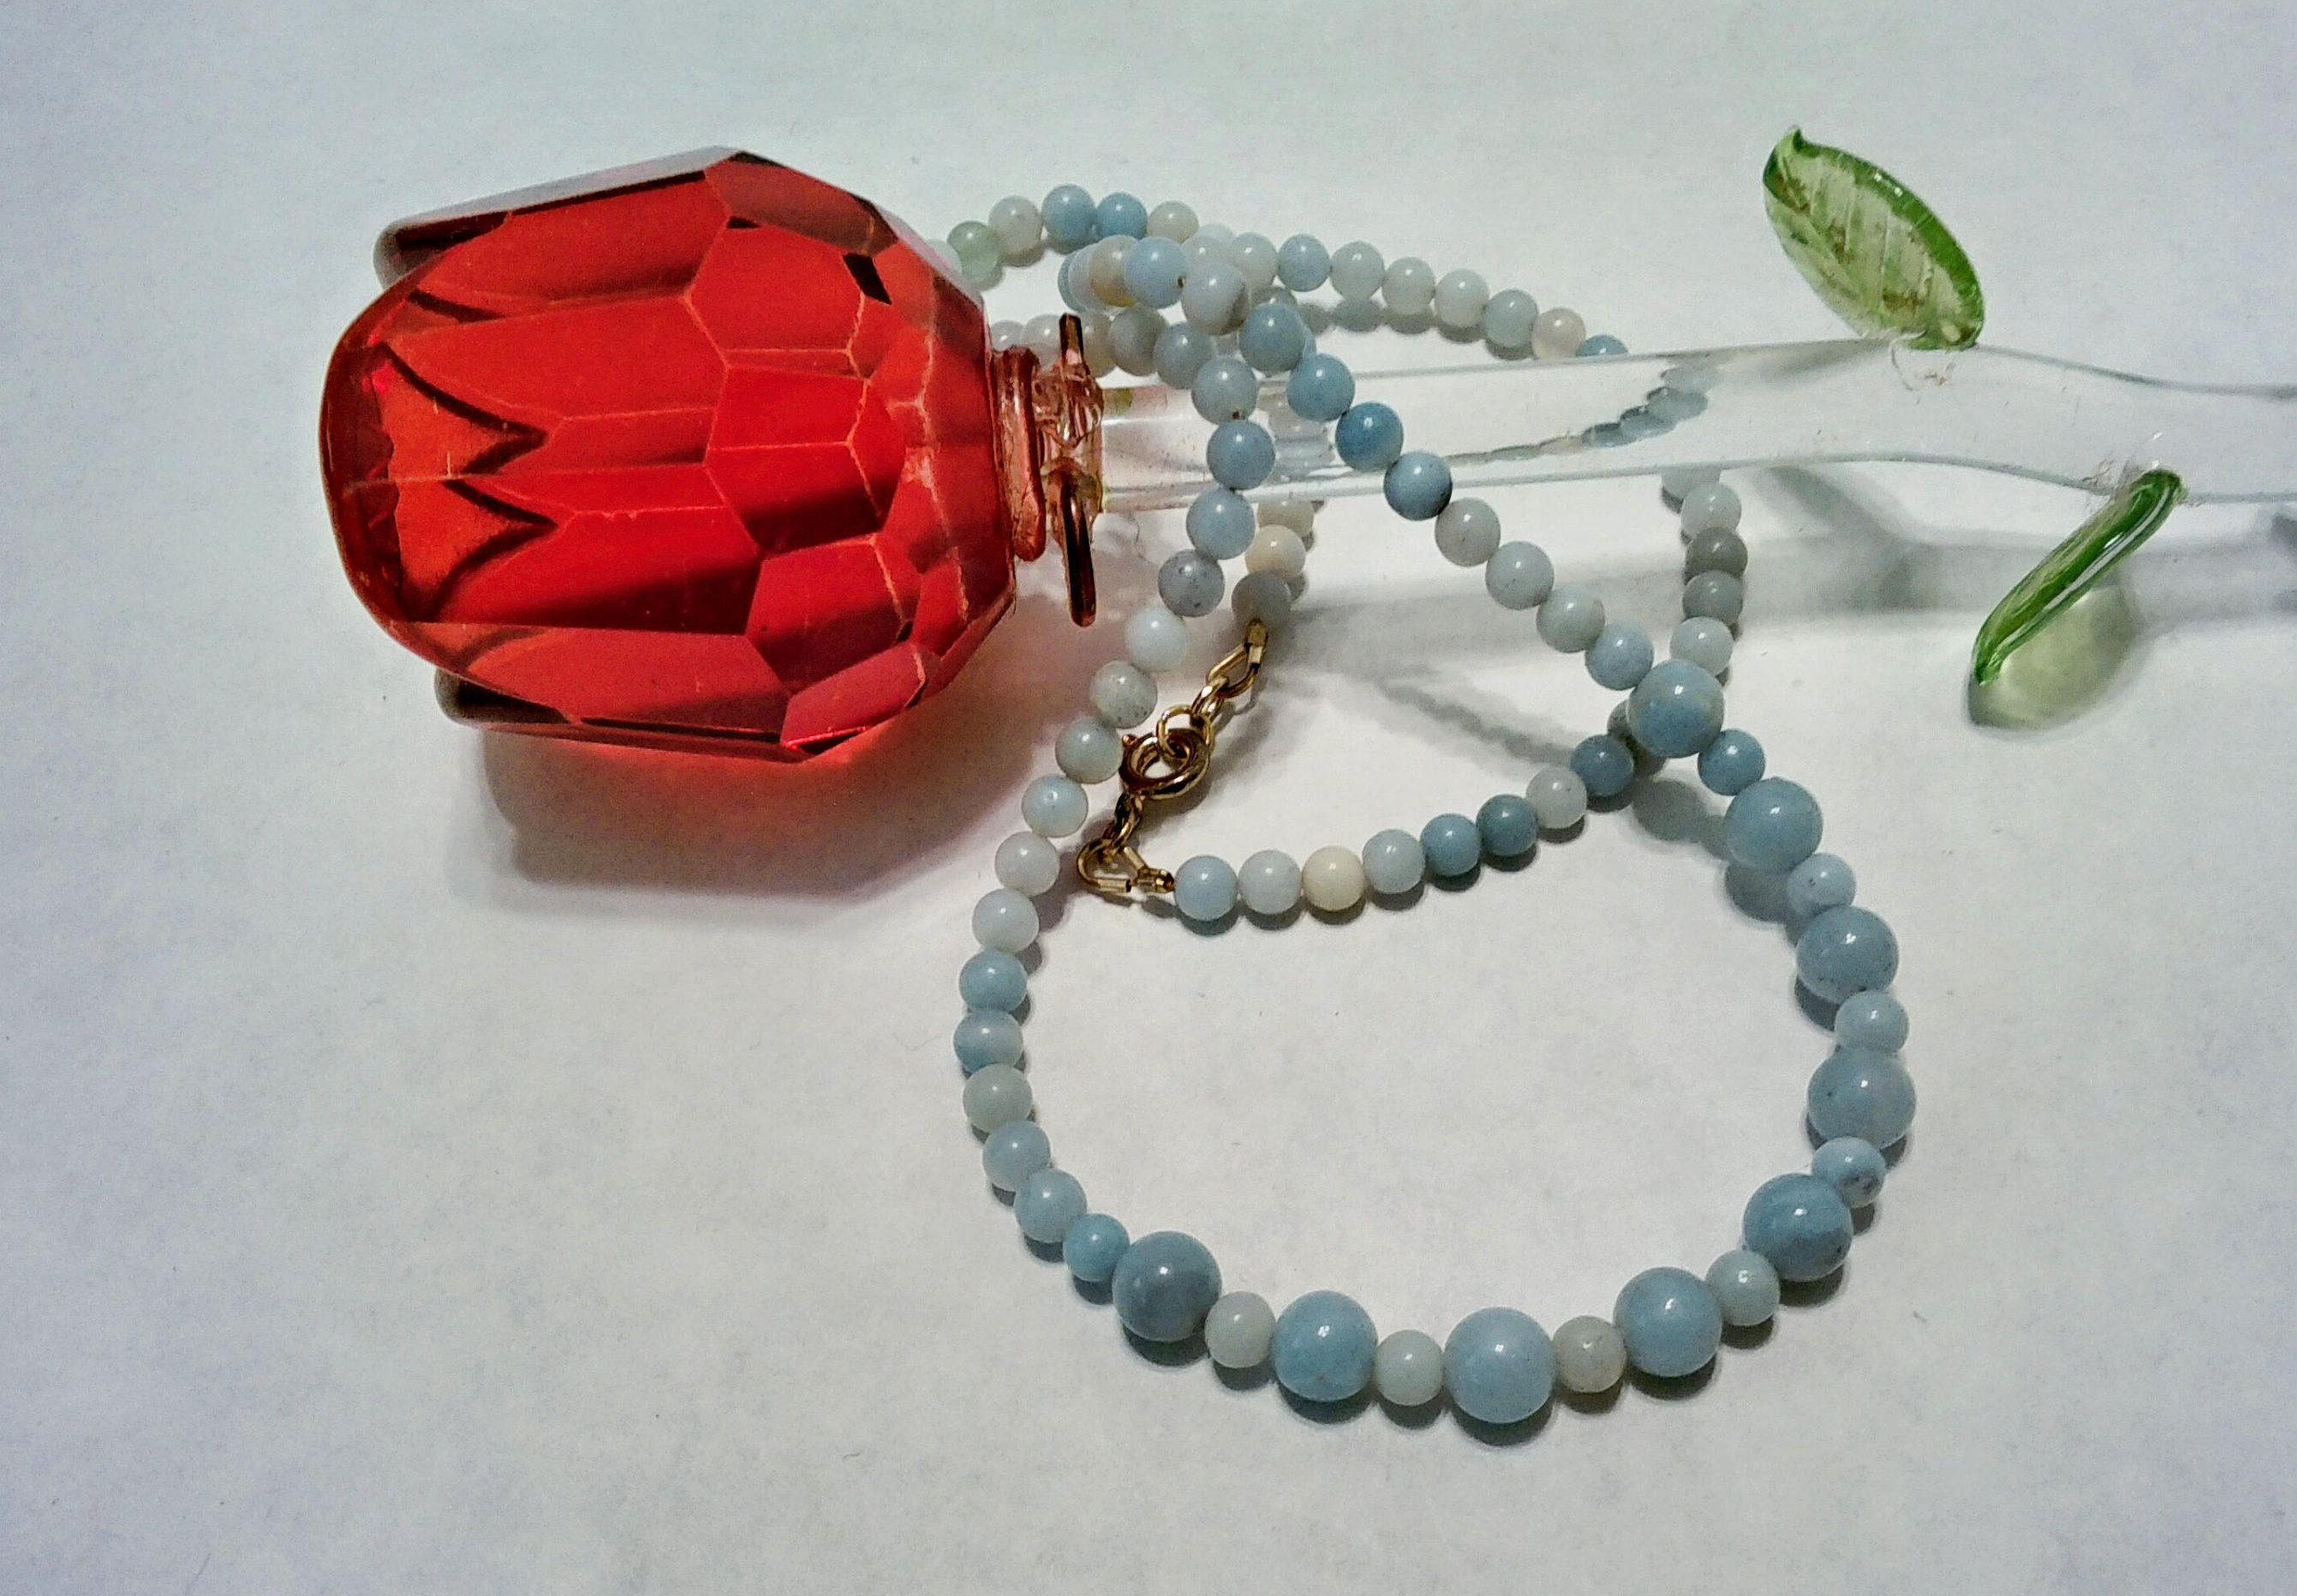 18 Inch Amazonite Necklace Blue Gold Minimalist Gift For Her Birthday Handmade Simple Feminine Wedding Anniversary